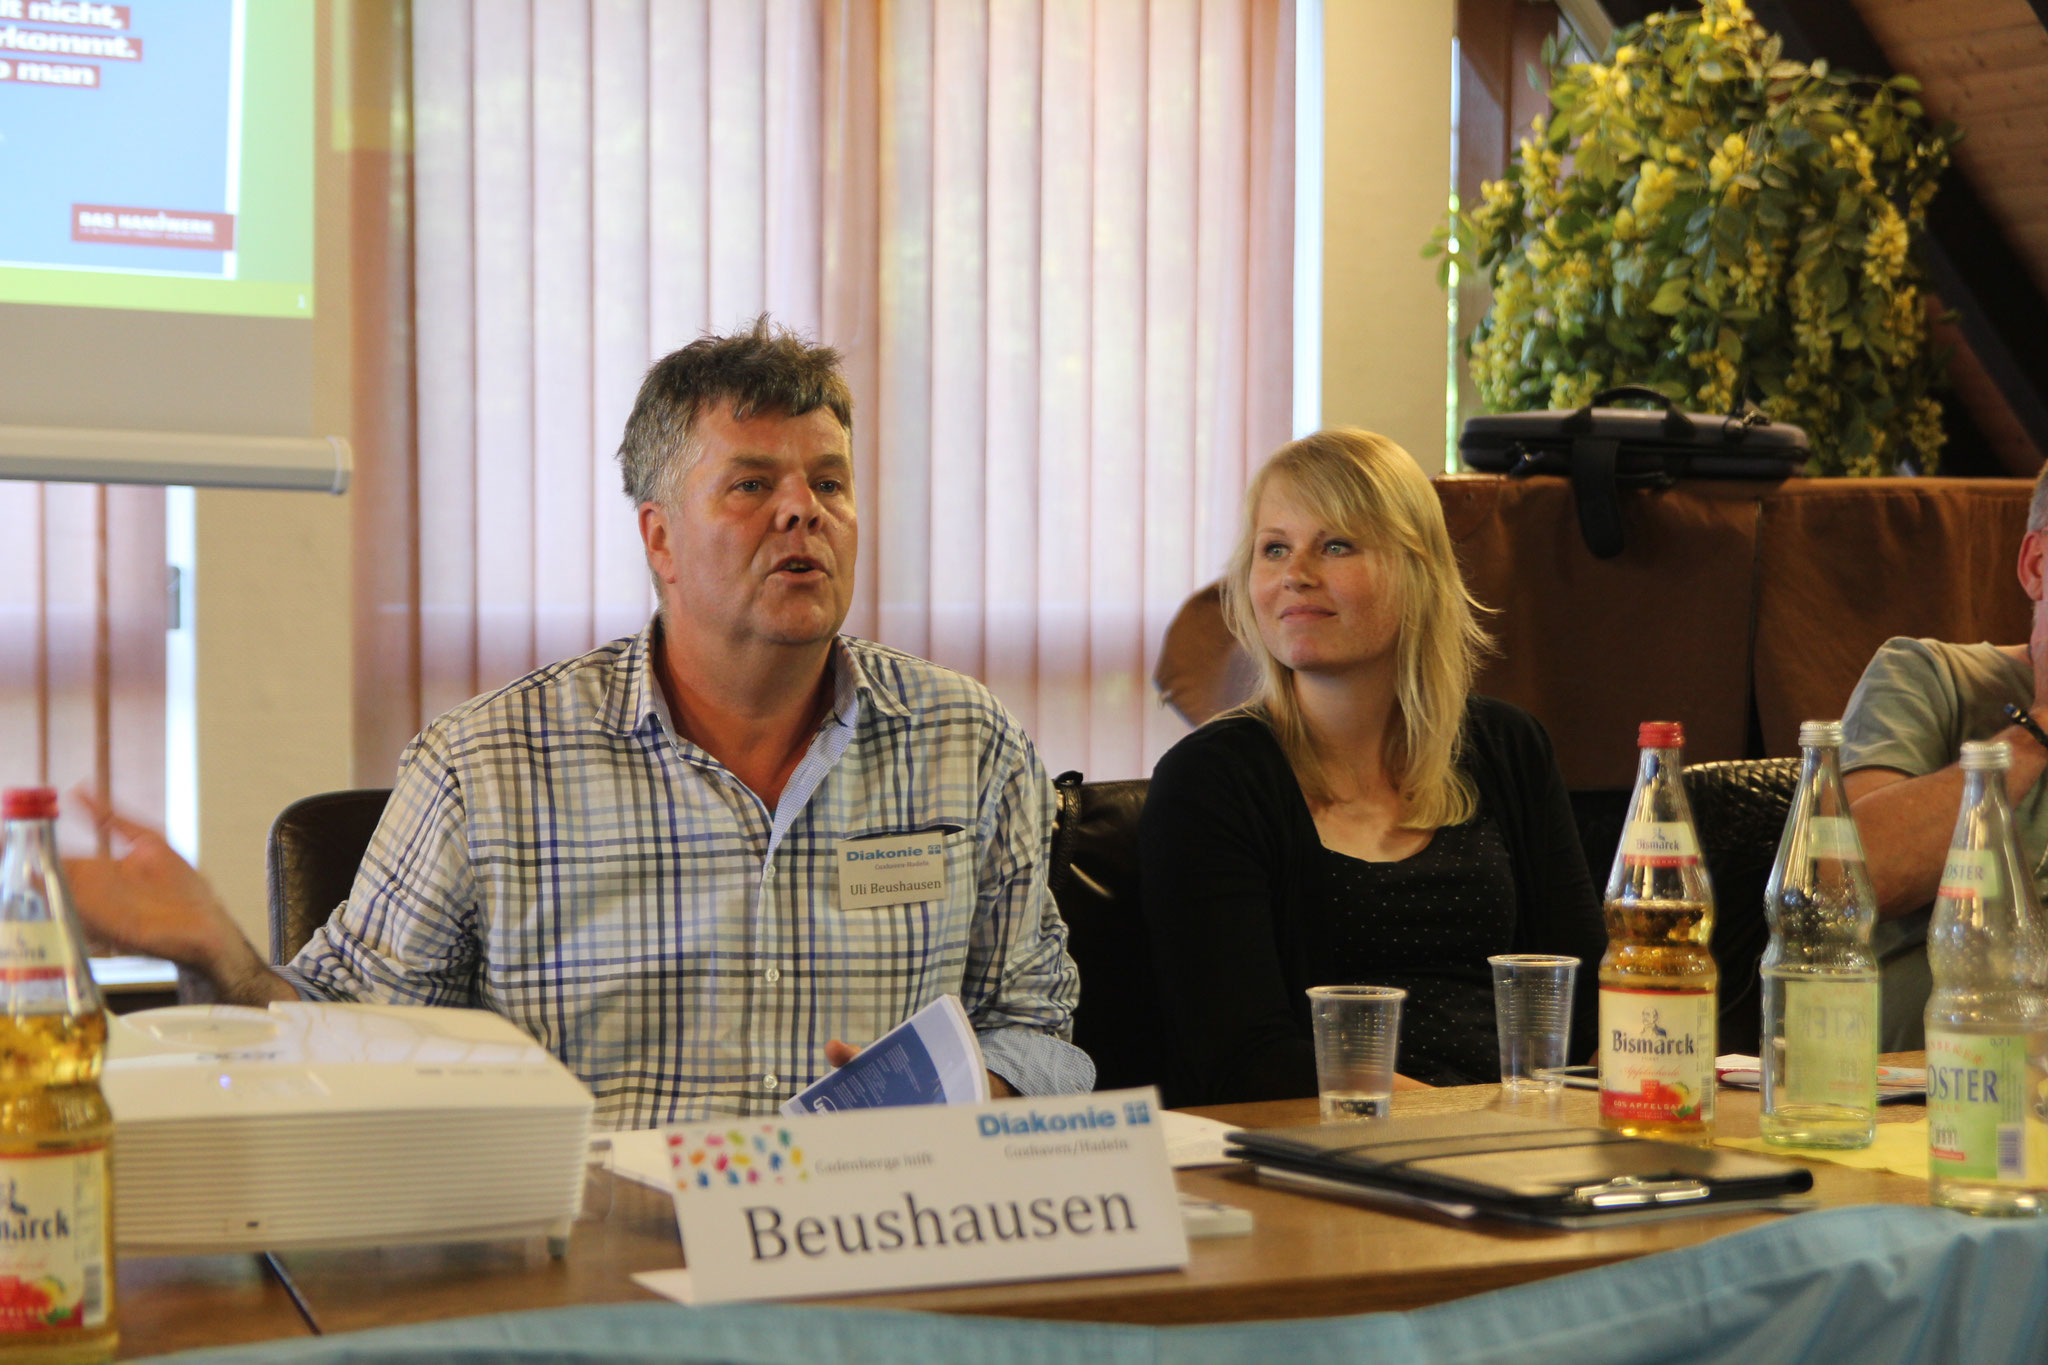 Frau Carrero (DRK) + Herr Beushausen (Diakonie + Bürgerinitiative Cadenberge hilft)